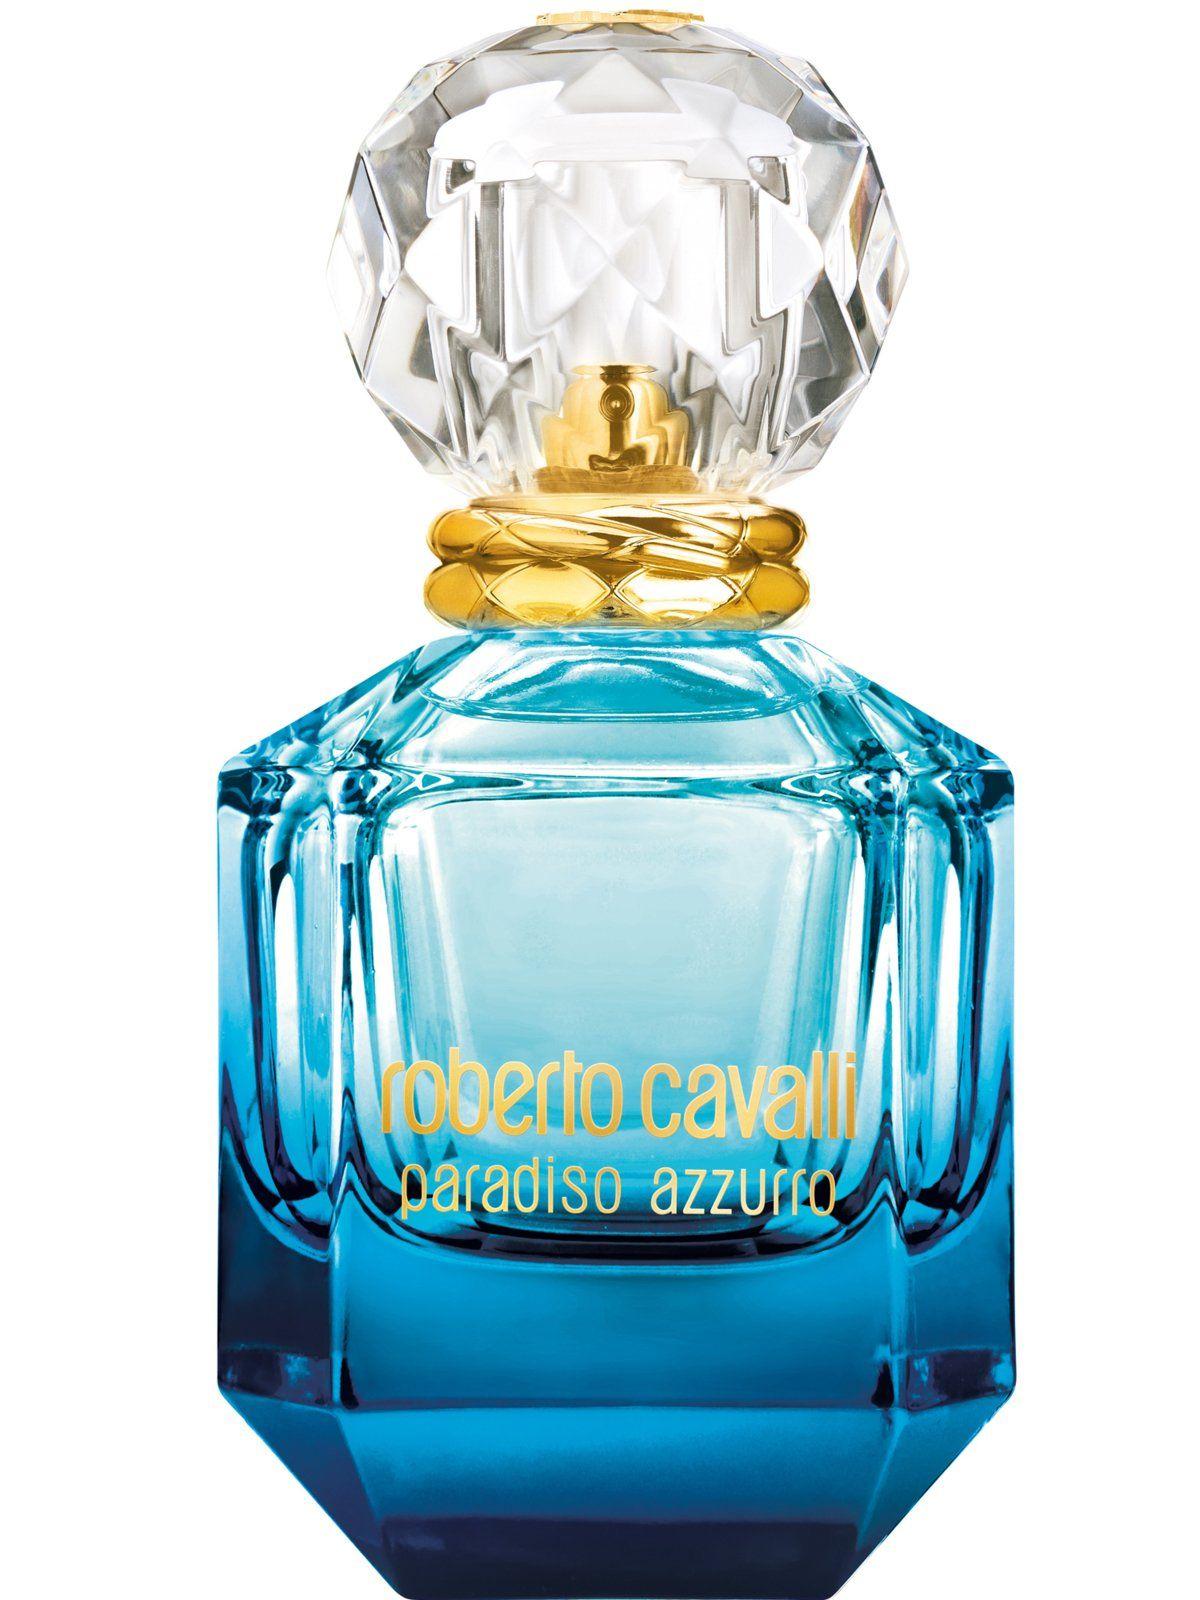 Aromatischer Duft Roberto Cavalli Paradiso Azzuro Parfum Dupes Parfum Duft